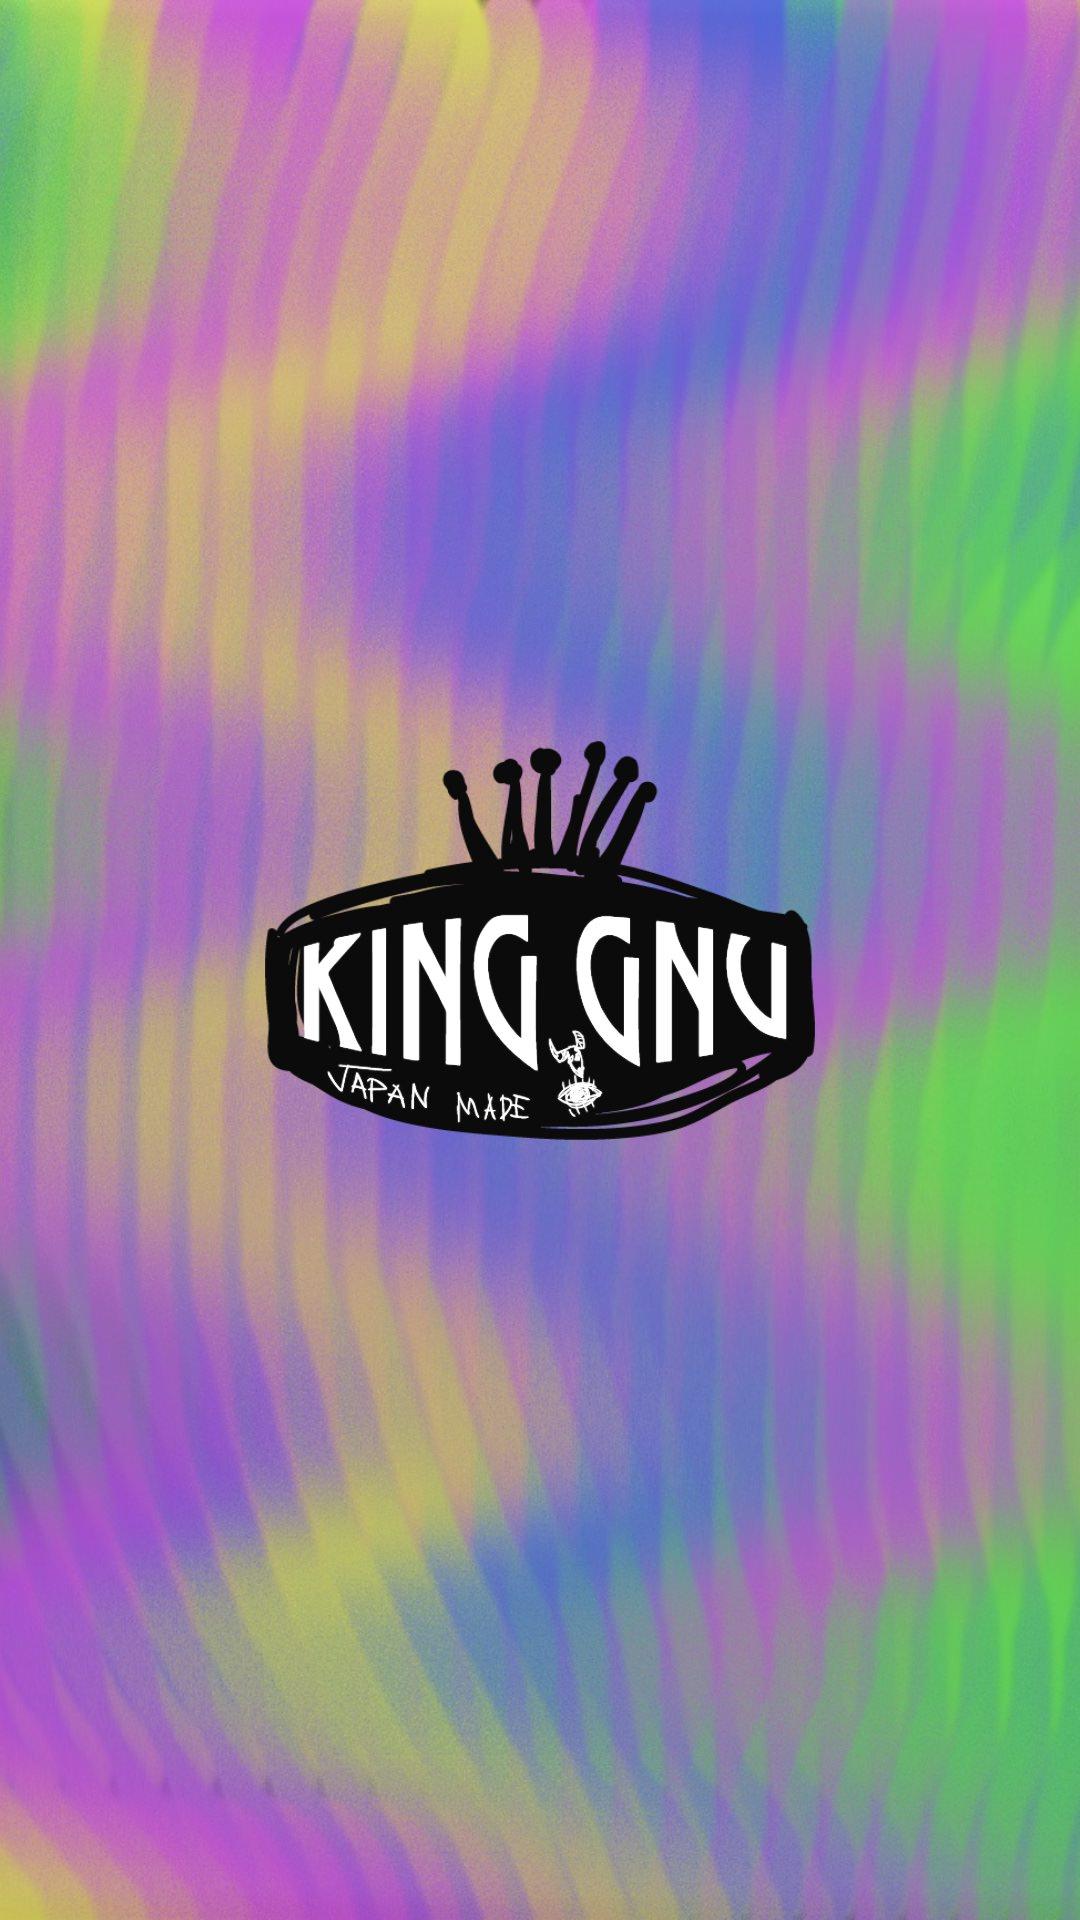 kinggnu28 - King Gnu/キングヌーのかっこいい✨️高画質スマホ壁紙28枚 [iPhone&Androidに対応]